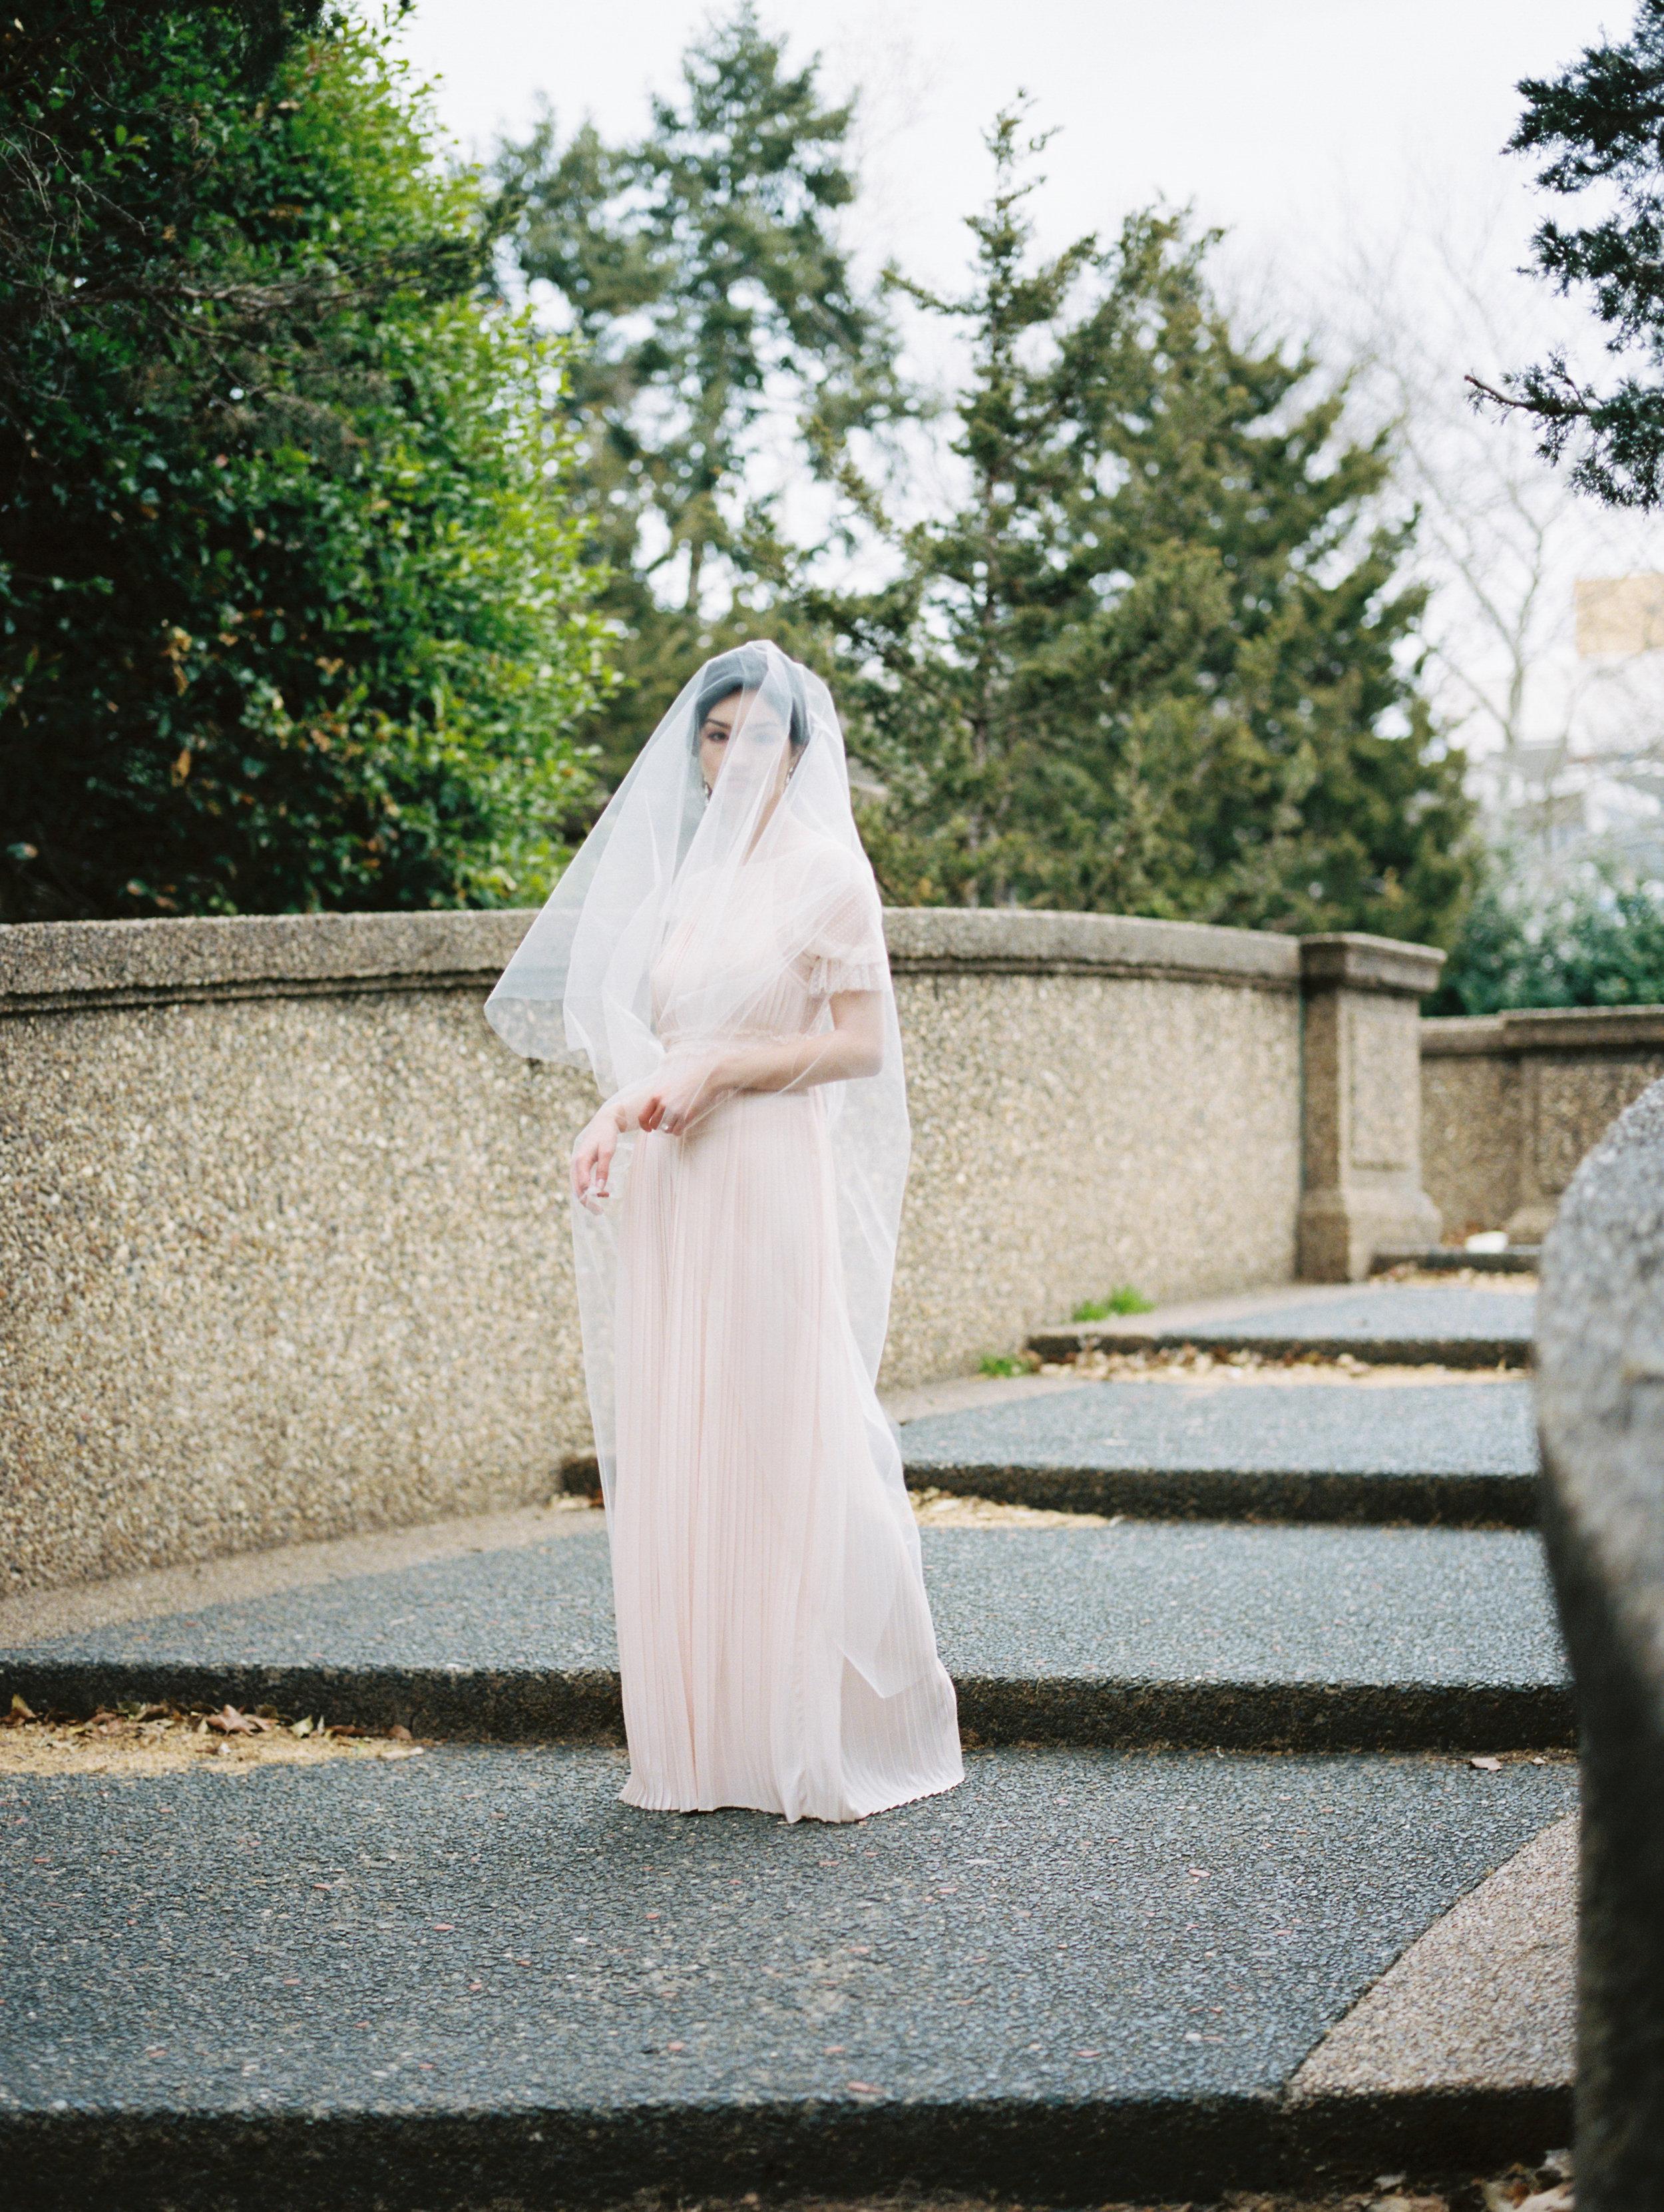 fingertip-wedding-veils-lindsay-marie-design